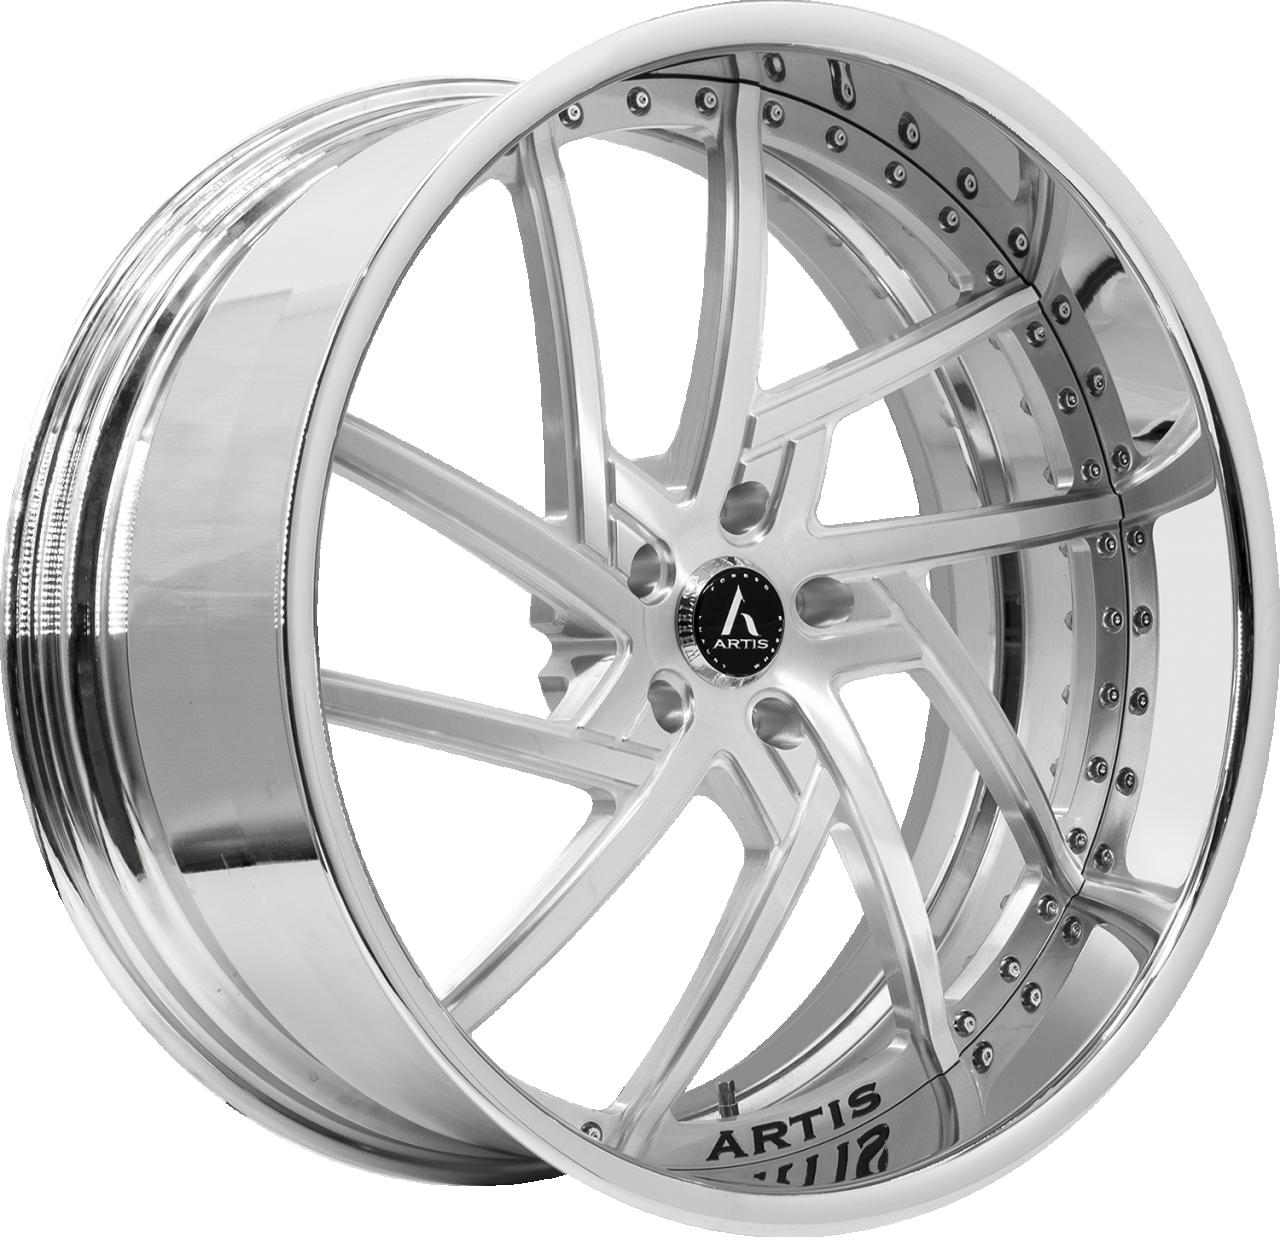 Artis Forged Fairfax wheel with Brushed finish